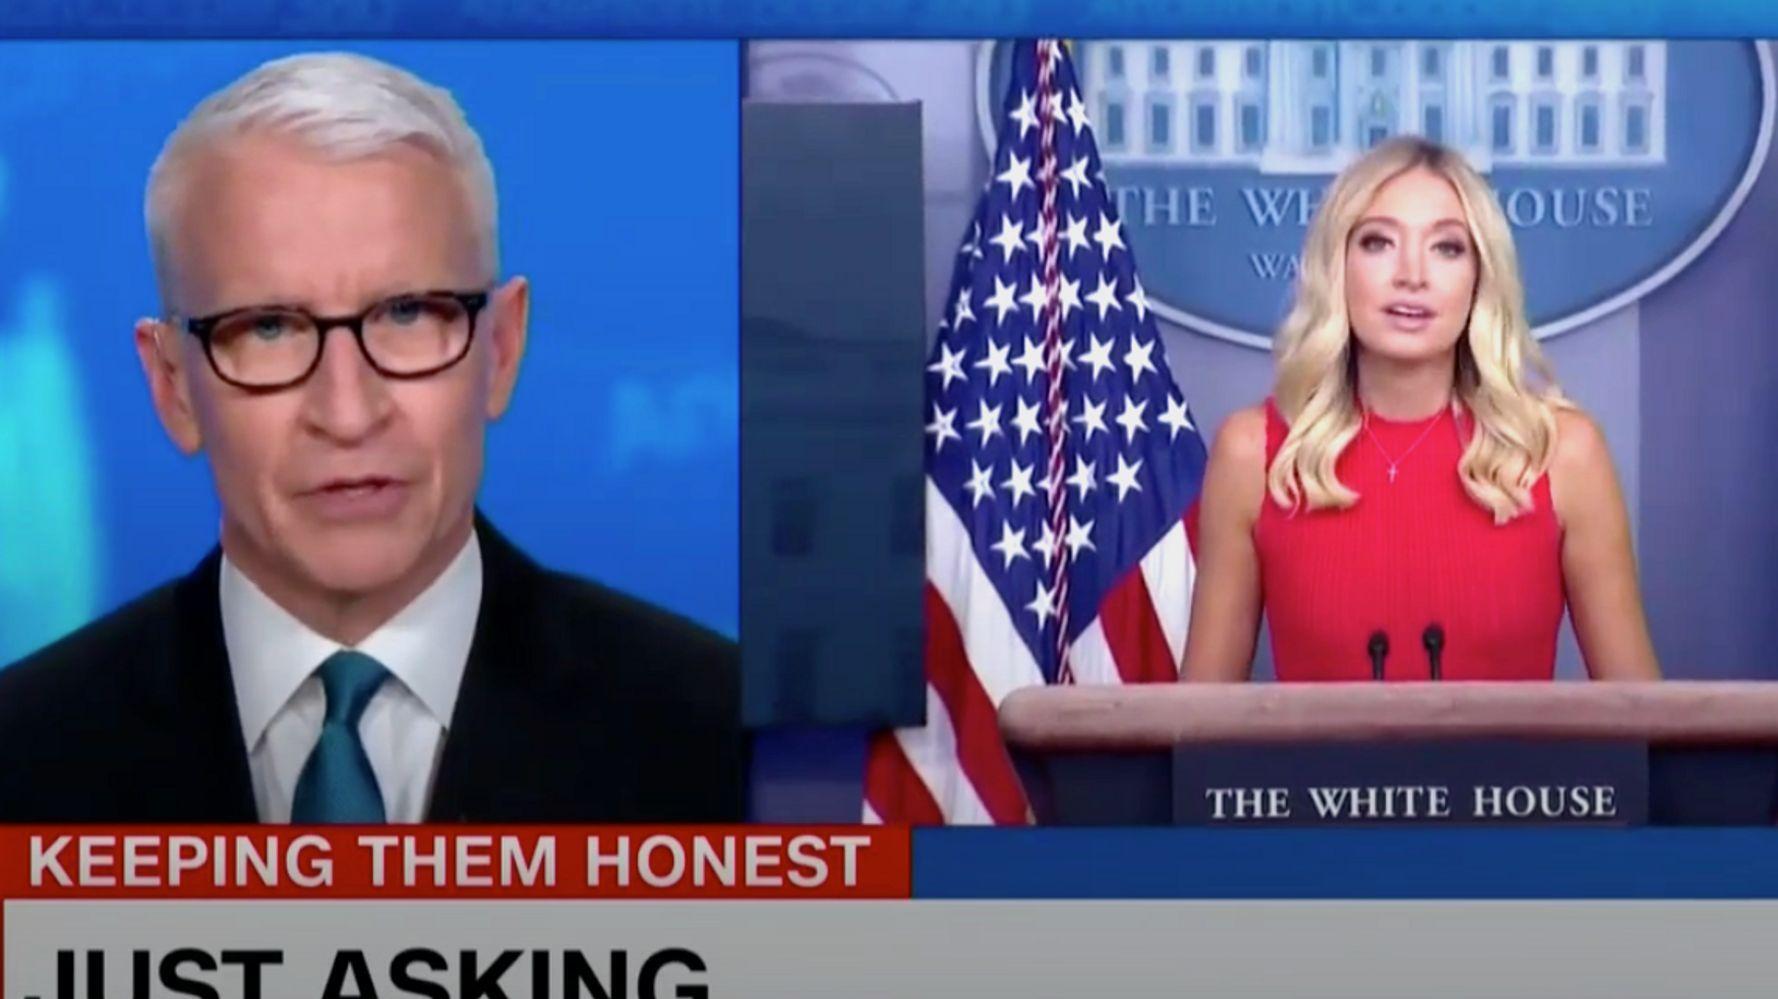 Anderson Cooper Blasts Lie Teller Kayleigh Mcenany For Orwellian Trump Defense Huffpost In 2020 Kayleigh Mcenany Anderson Cooper Trump Press Secretary